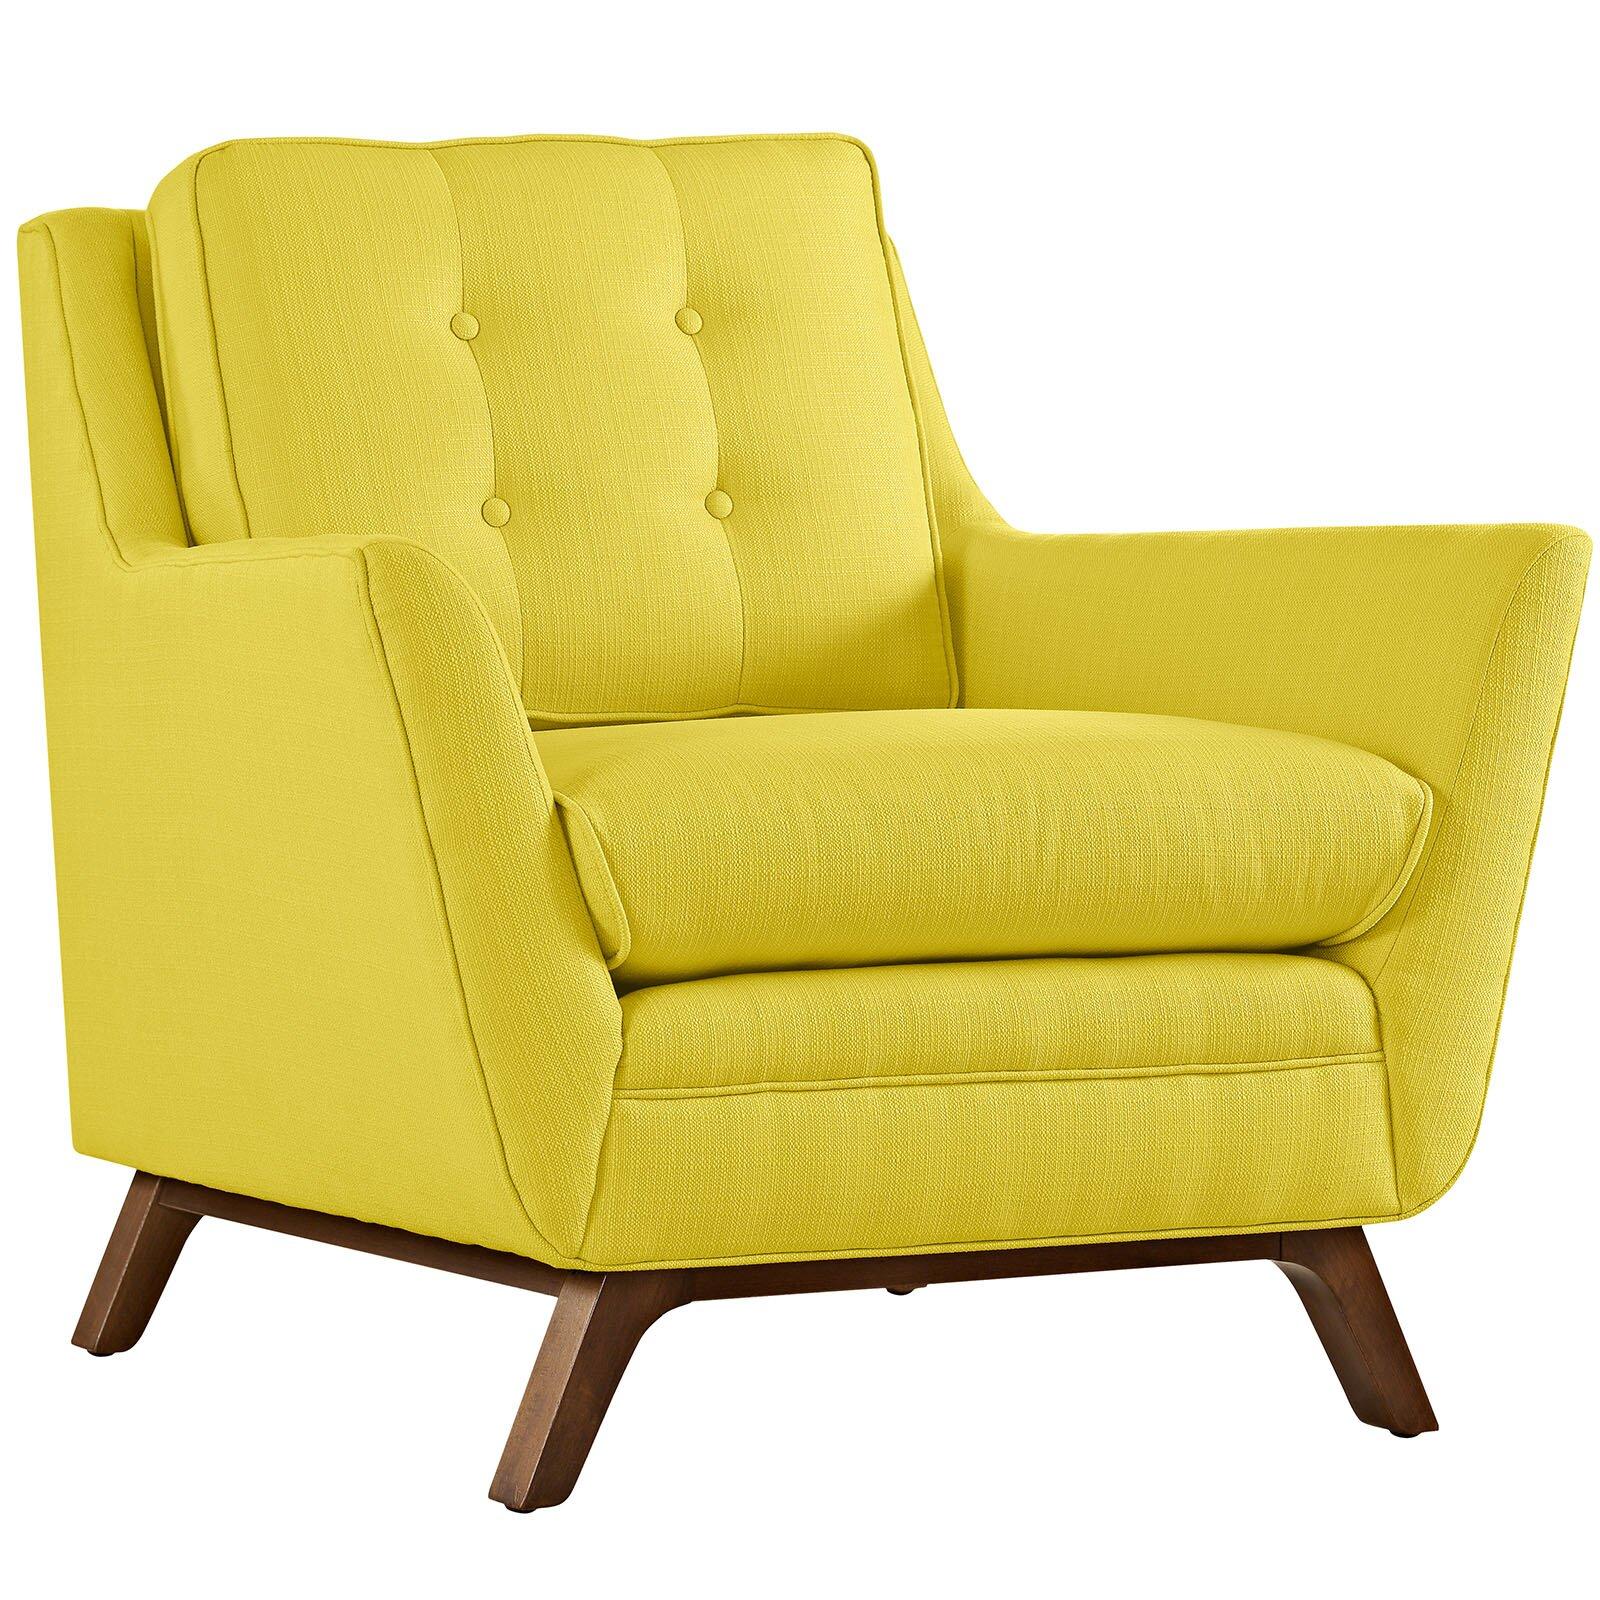 Modway Beguile Arm Chair Amp Reviews Wayfair